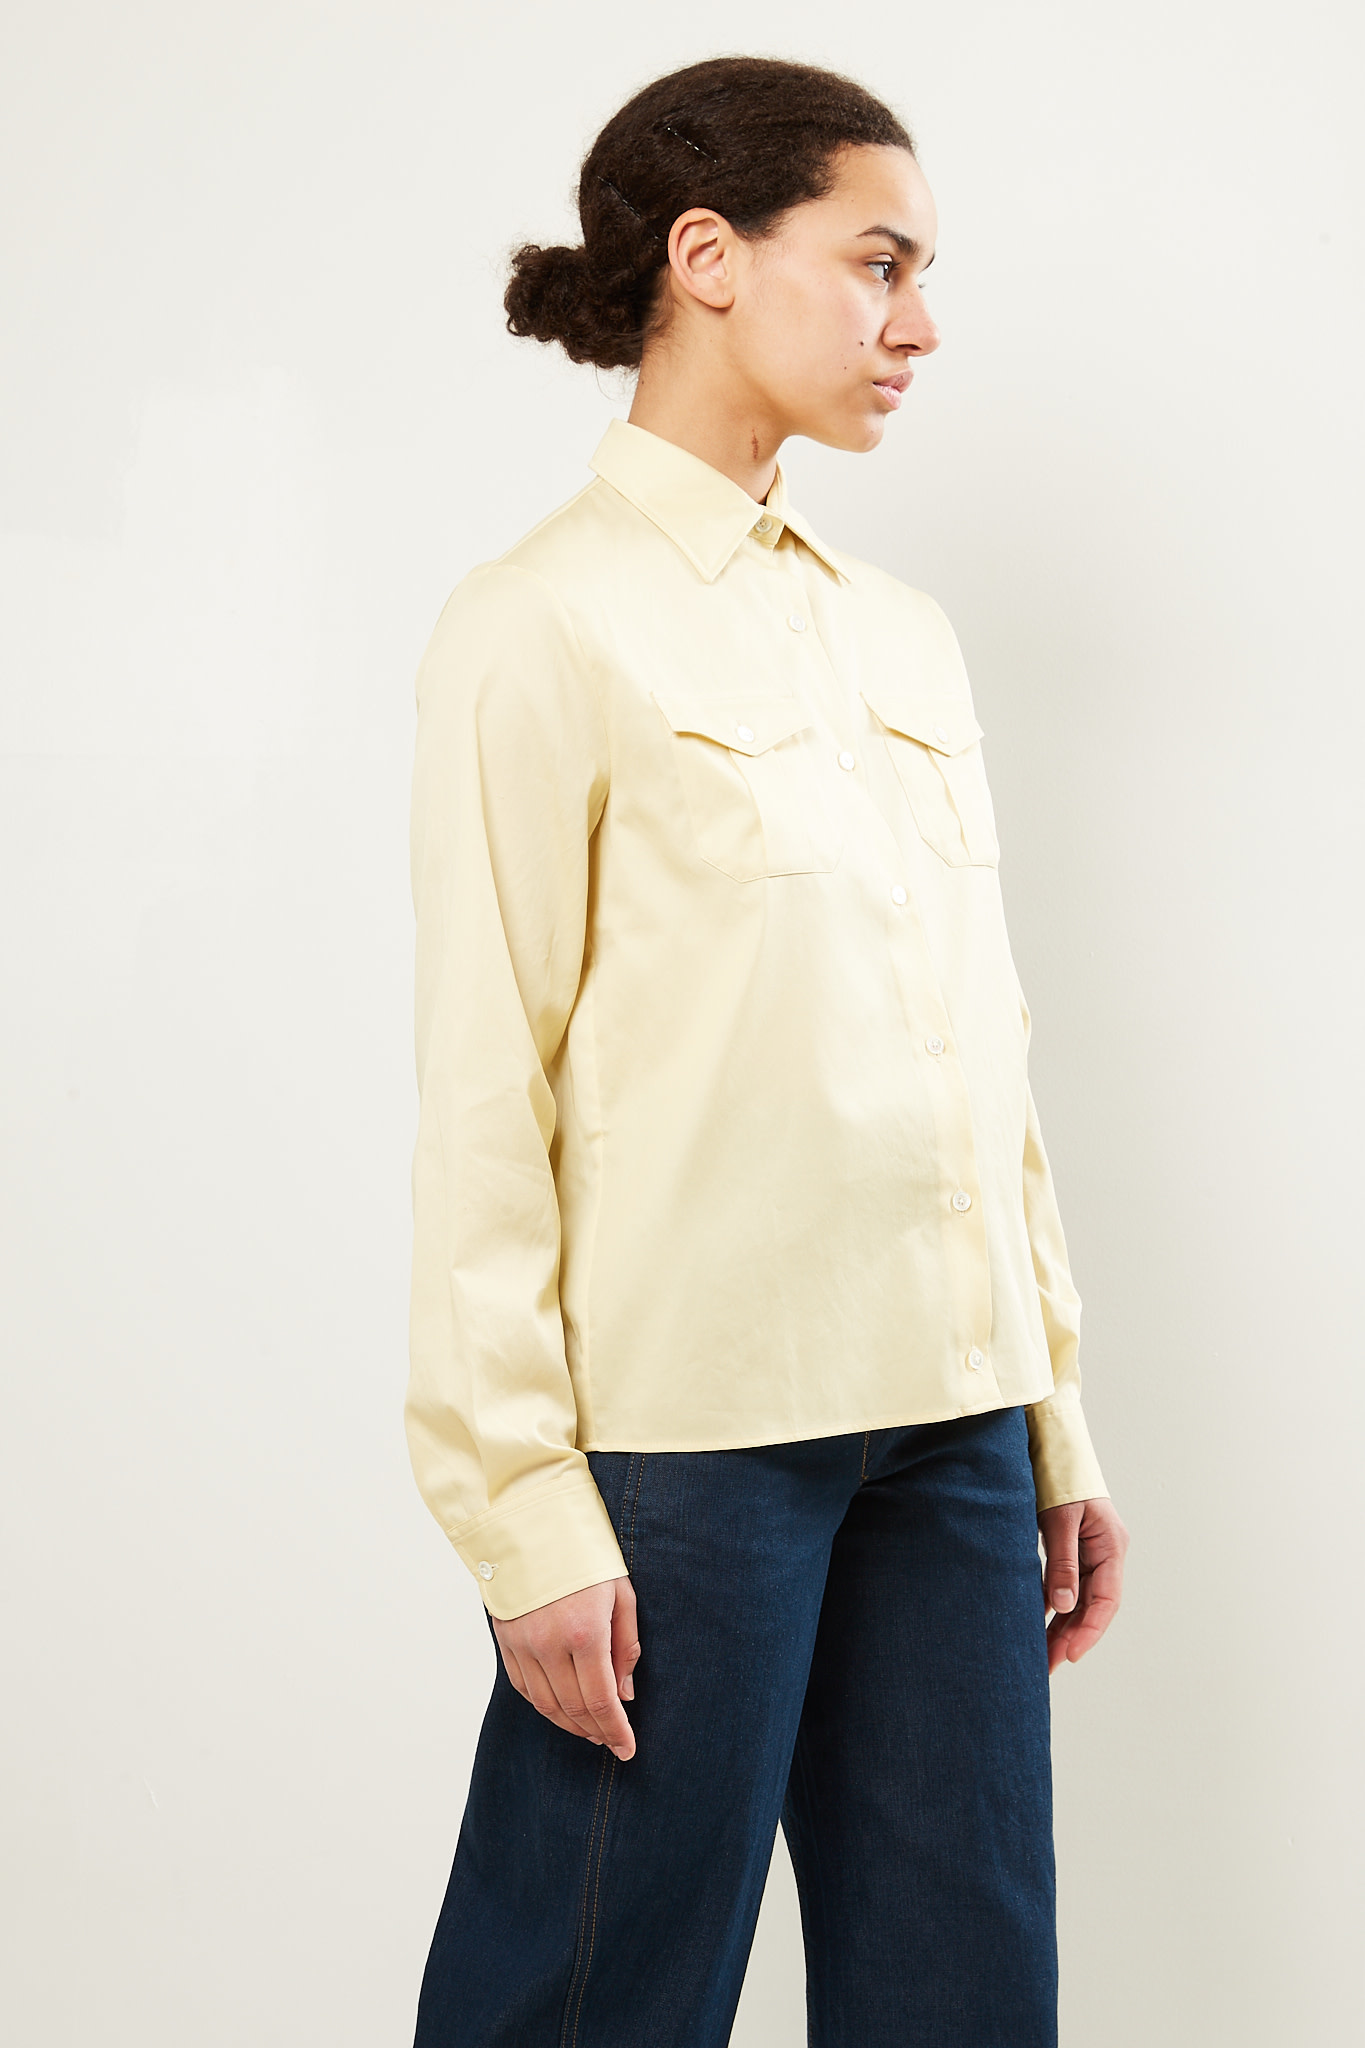 Lemaire - 2 pocket shirt